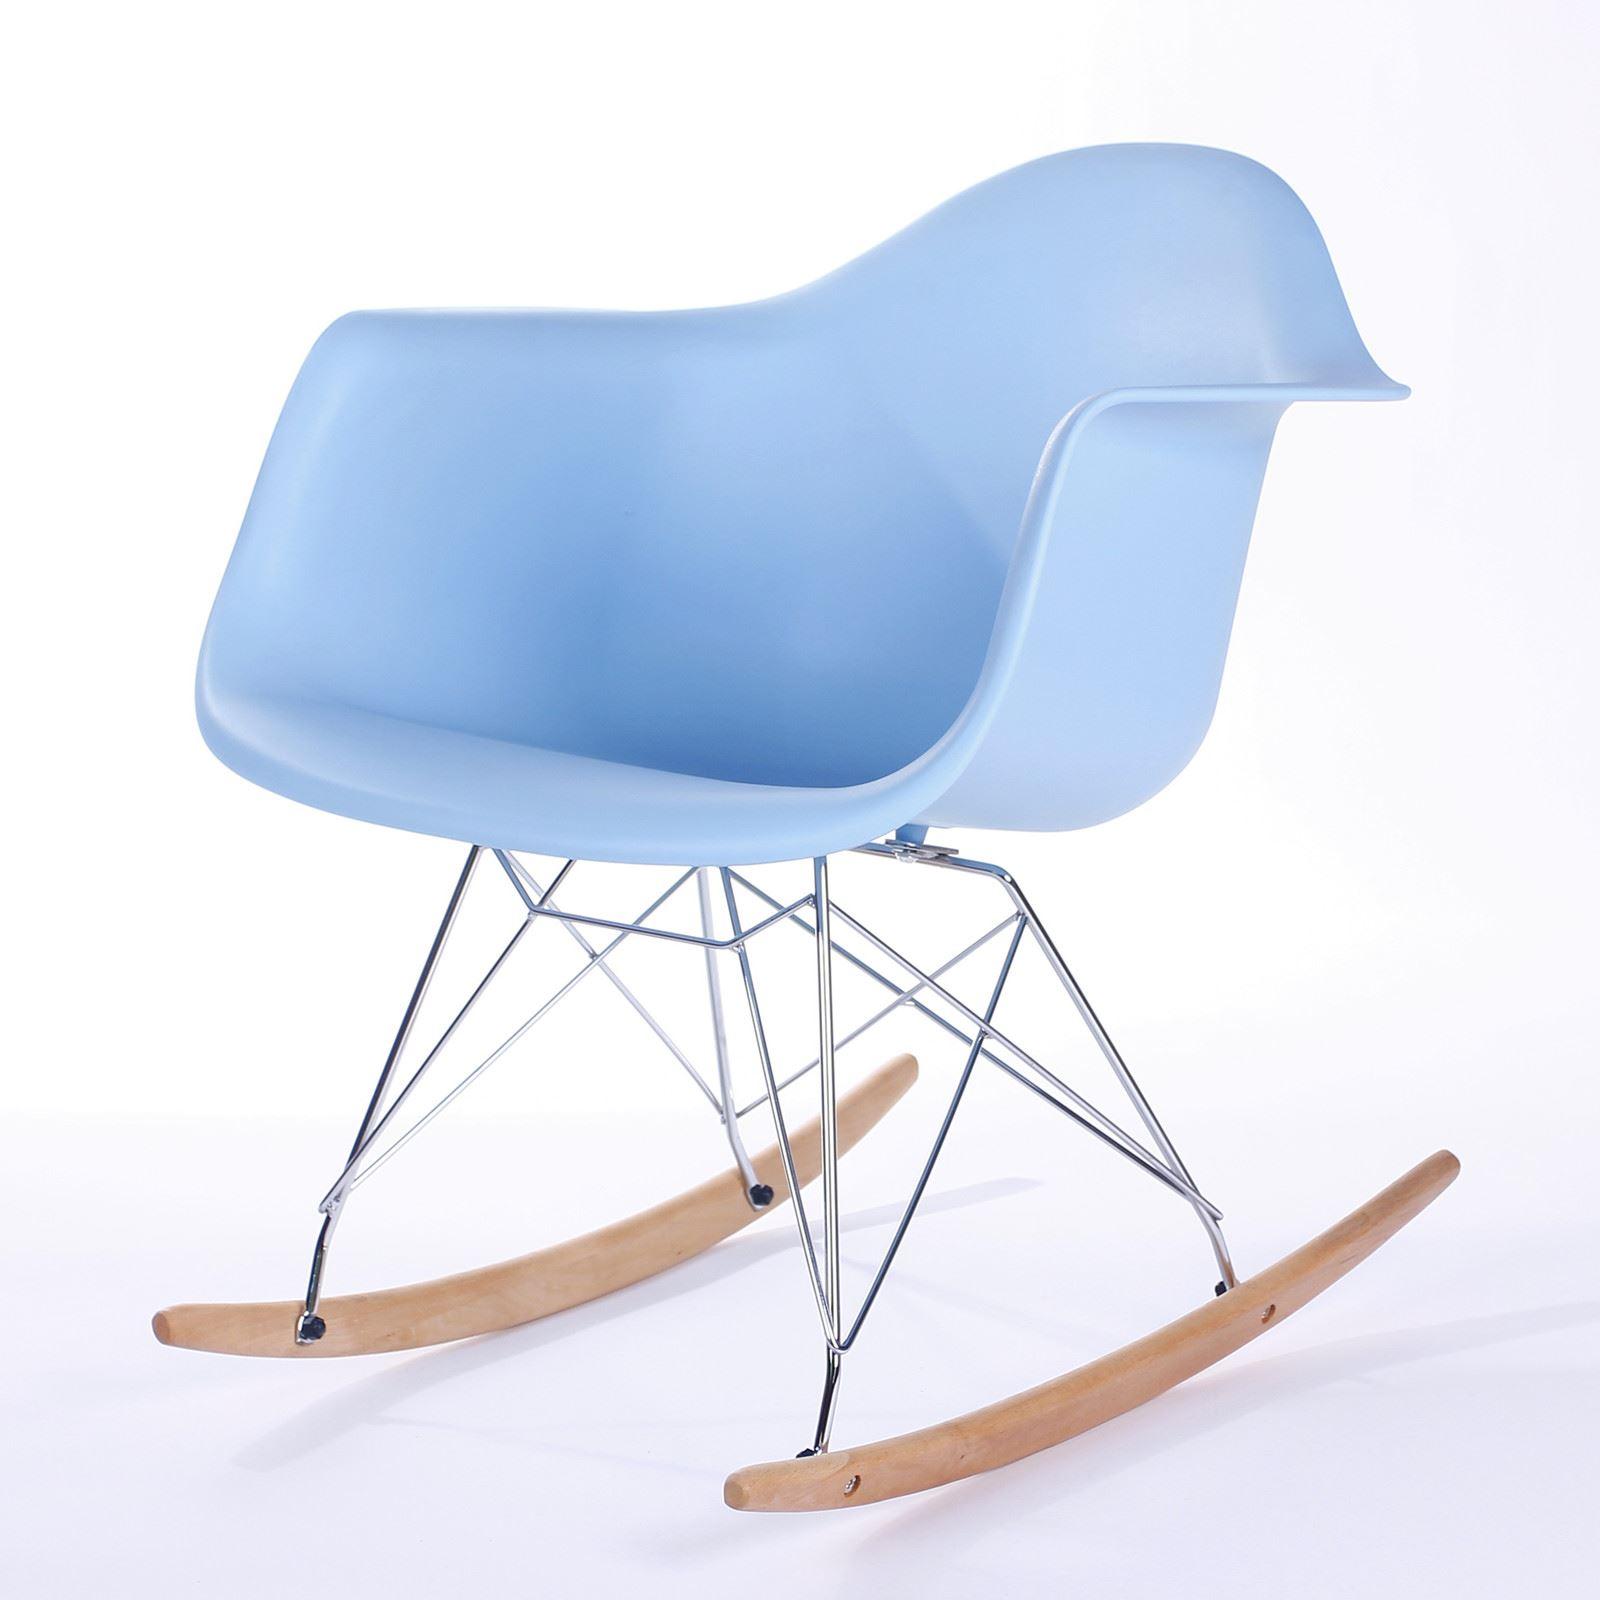 charles ray eames eiffel inspired clear rar side dining chair  - charlesrayeameseiffelinspiredclearrarside